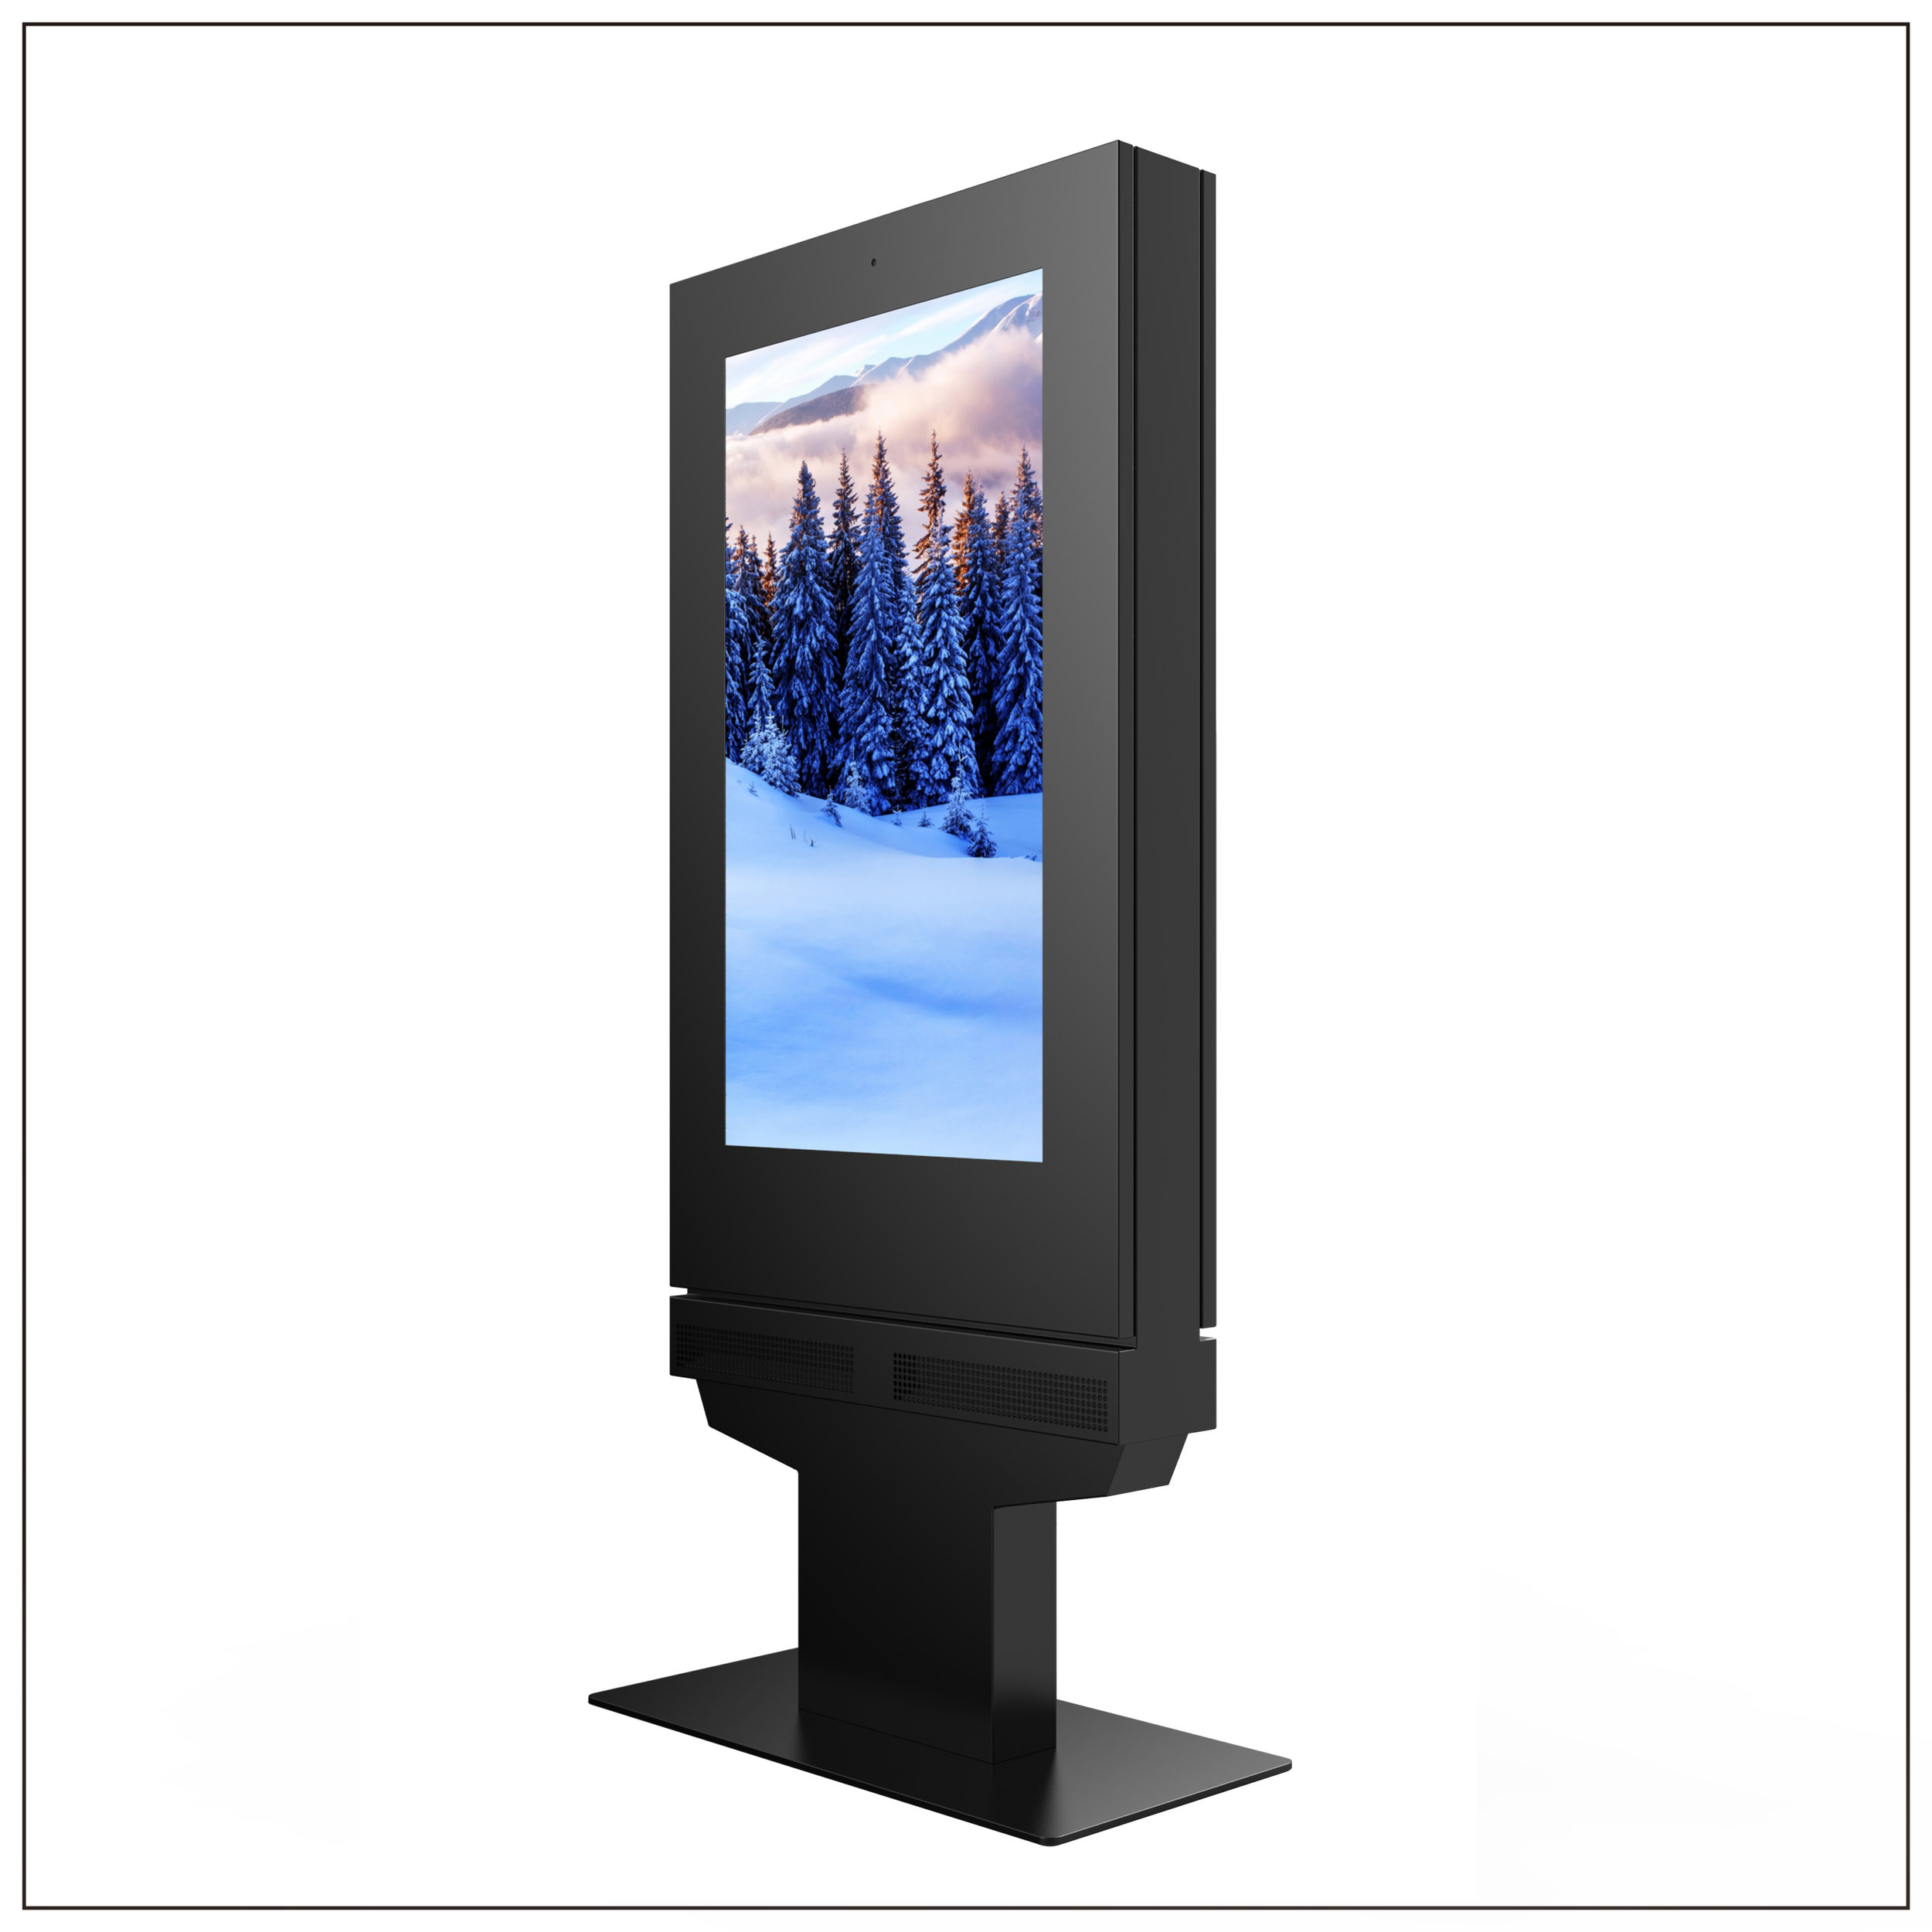 Outdoor High Brightness Displays - Panel Size: 43, 55, 65 inchBrightness : 3000 nitResolution: 1920 × 1080